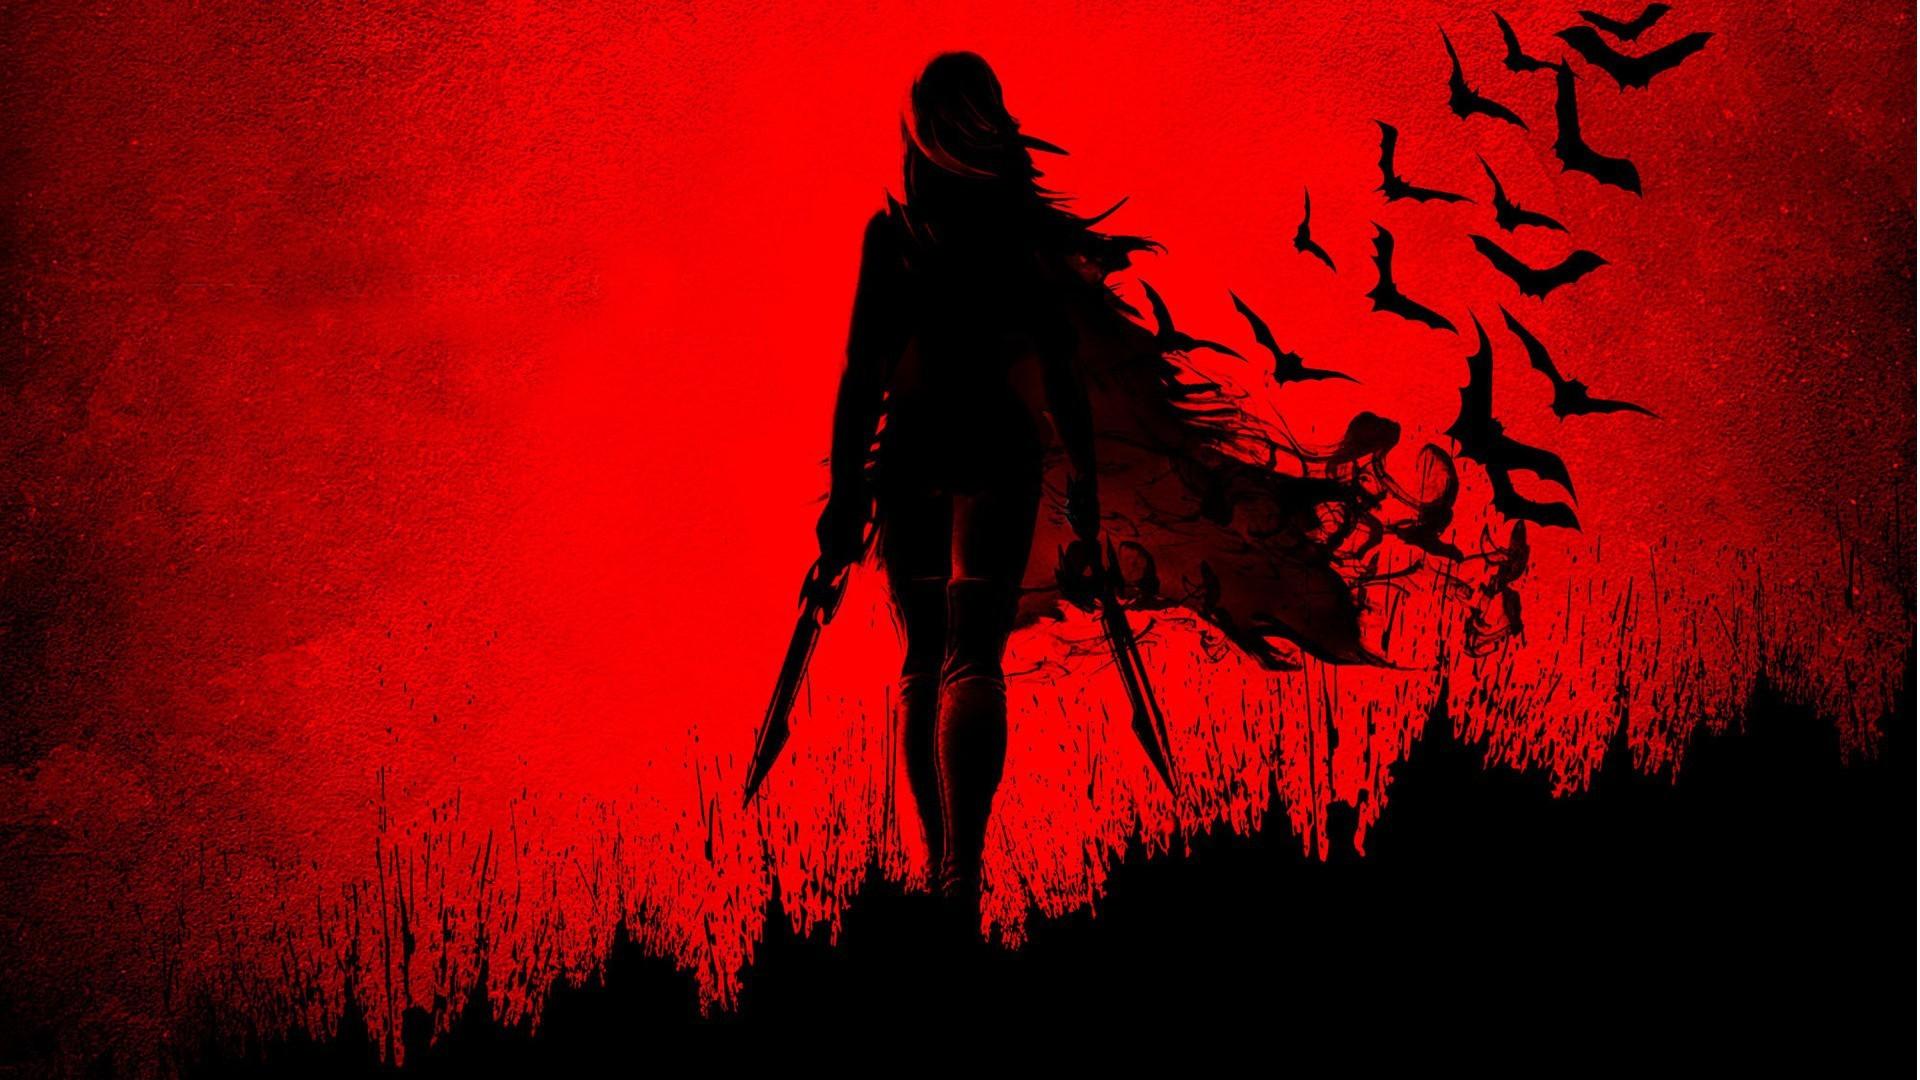 Download Wallpaper Swords Blade And Soul Blade Amp Soul